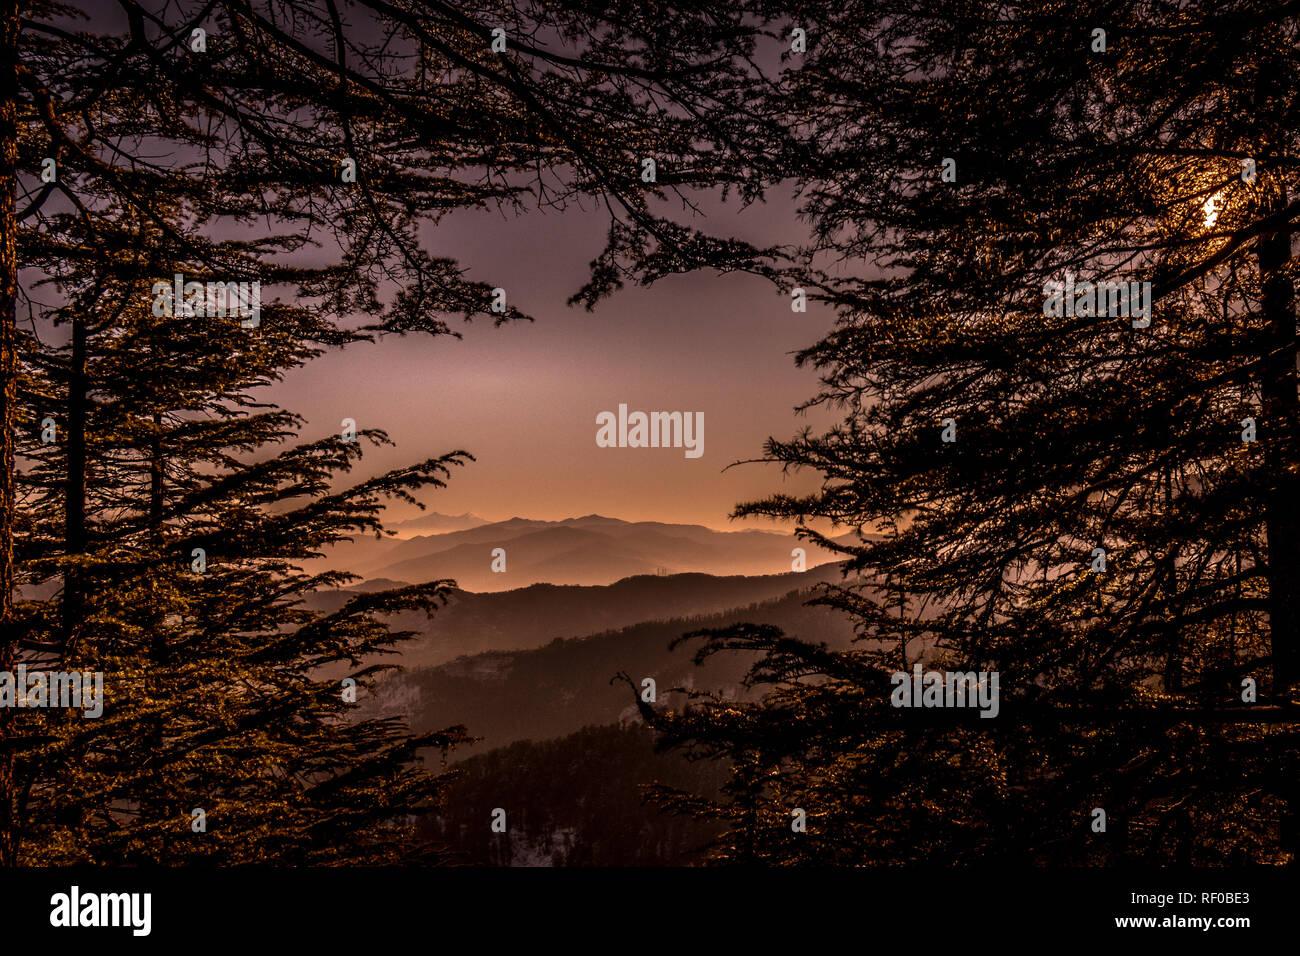 The morning raga! Stock Photo